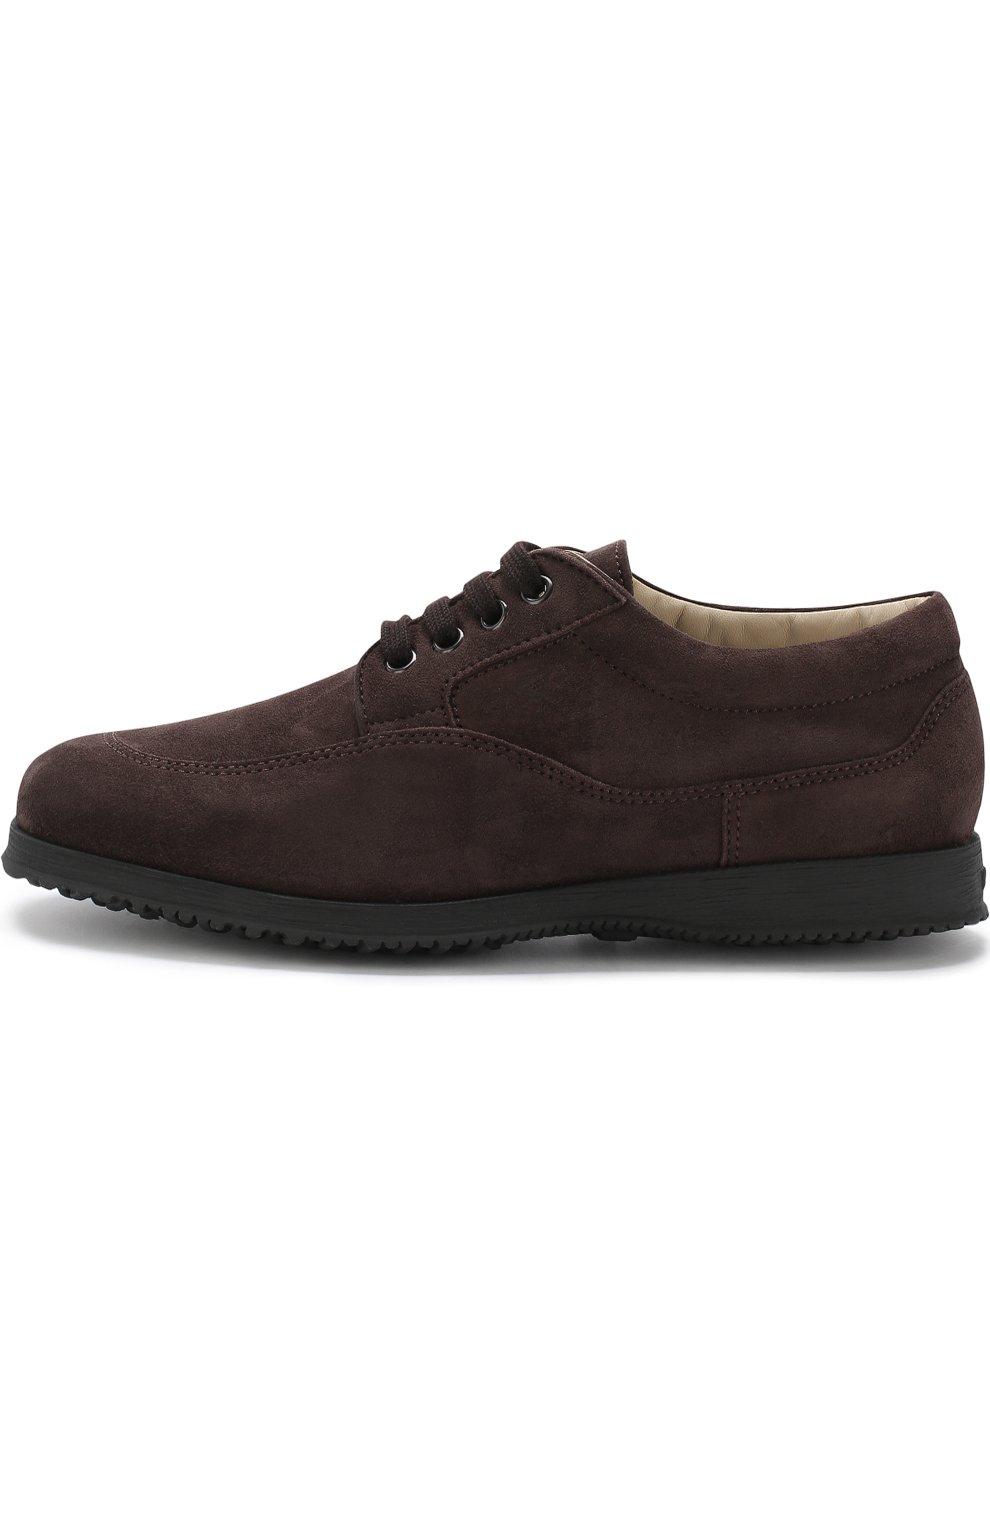 Замшевые ботинки Traditional на шнуровке | Фото №3